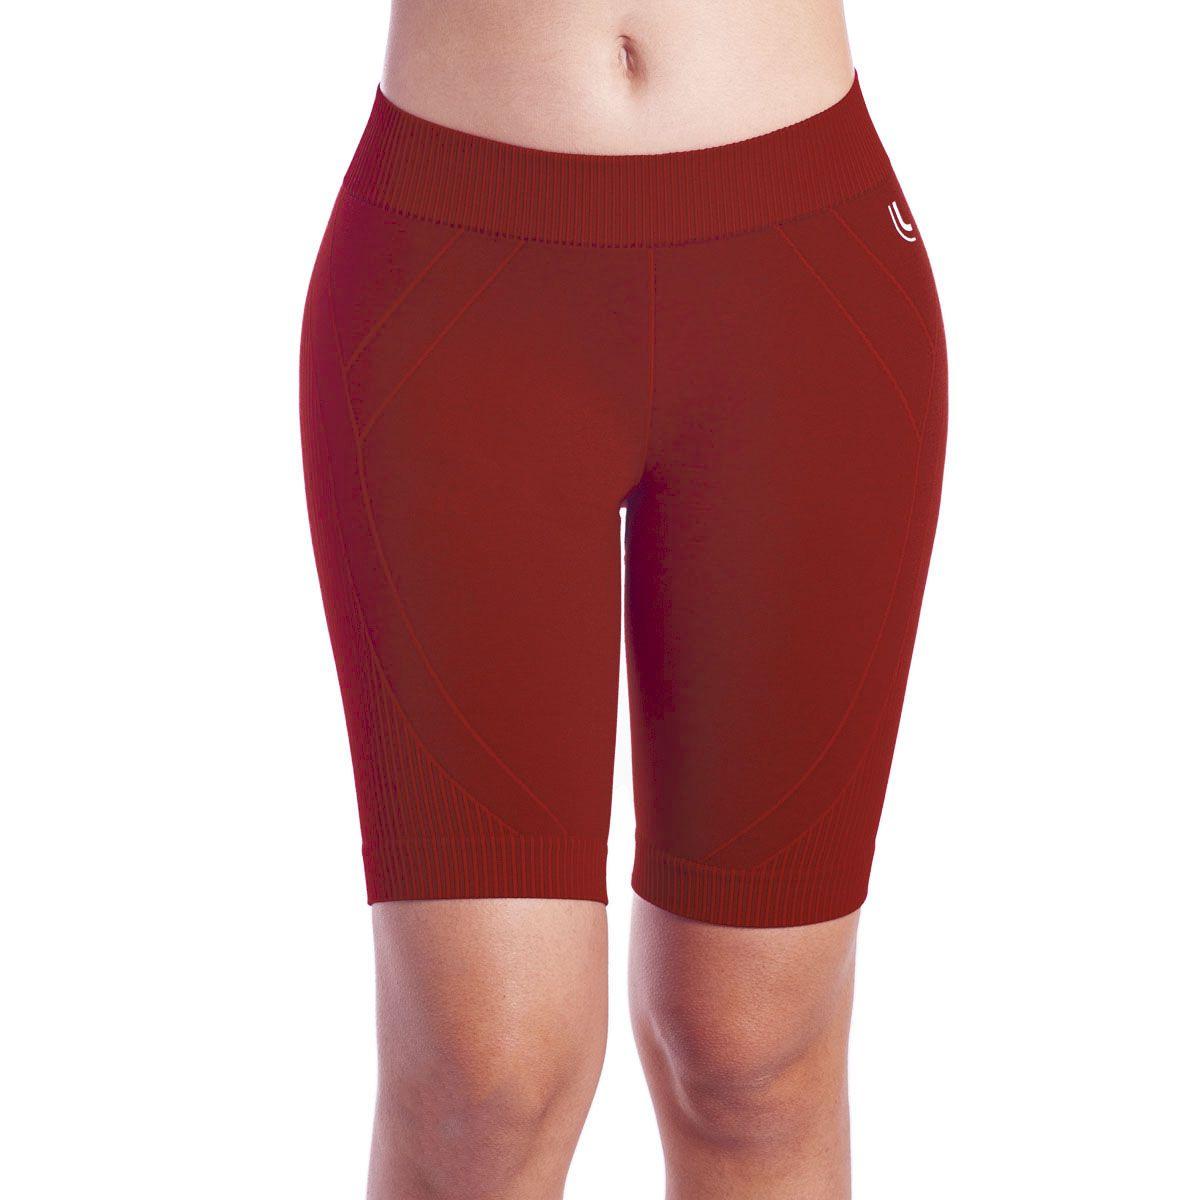 Roupa feminina academia ginástica fitness bermuda Lupo